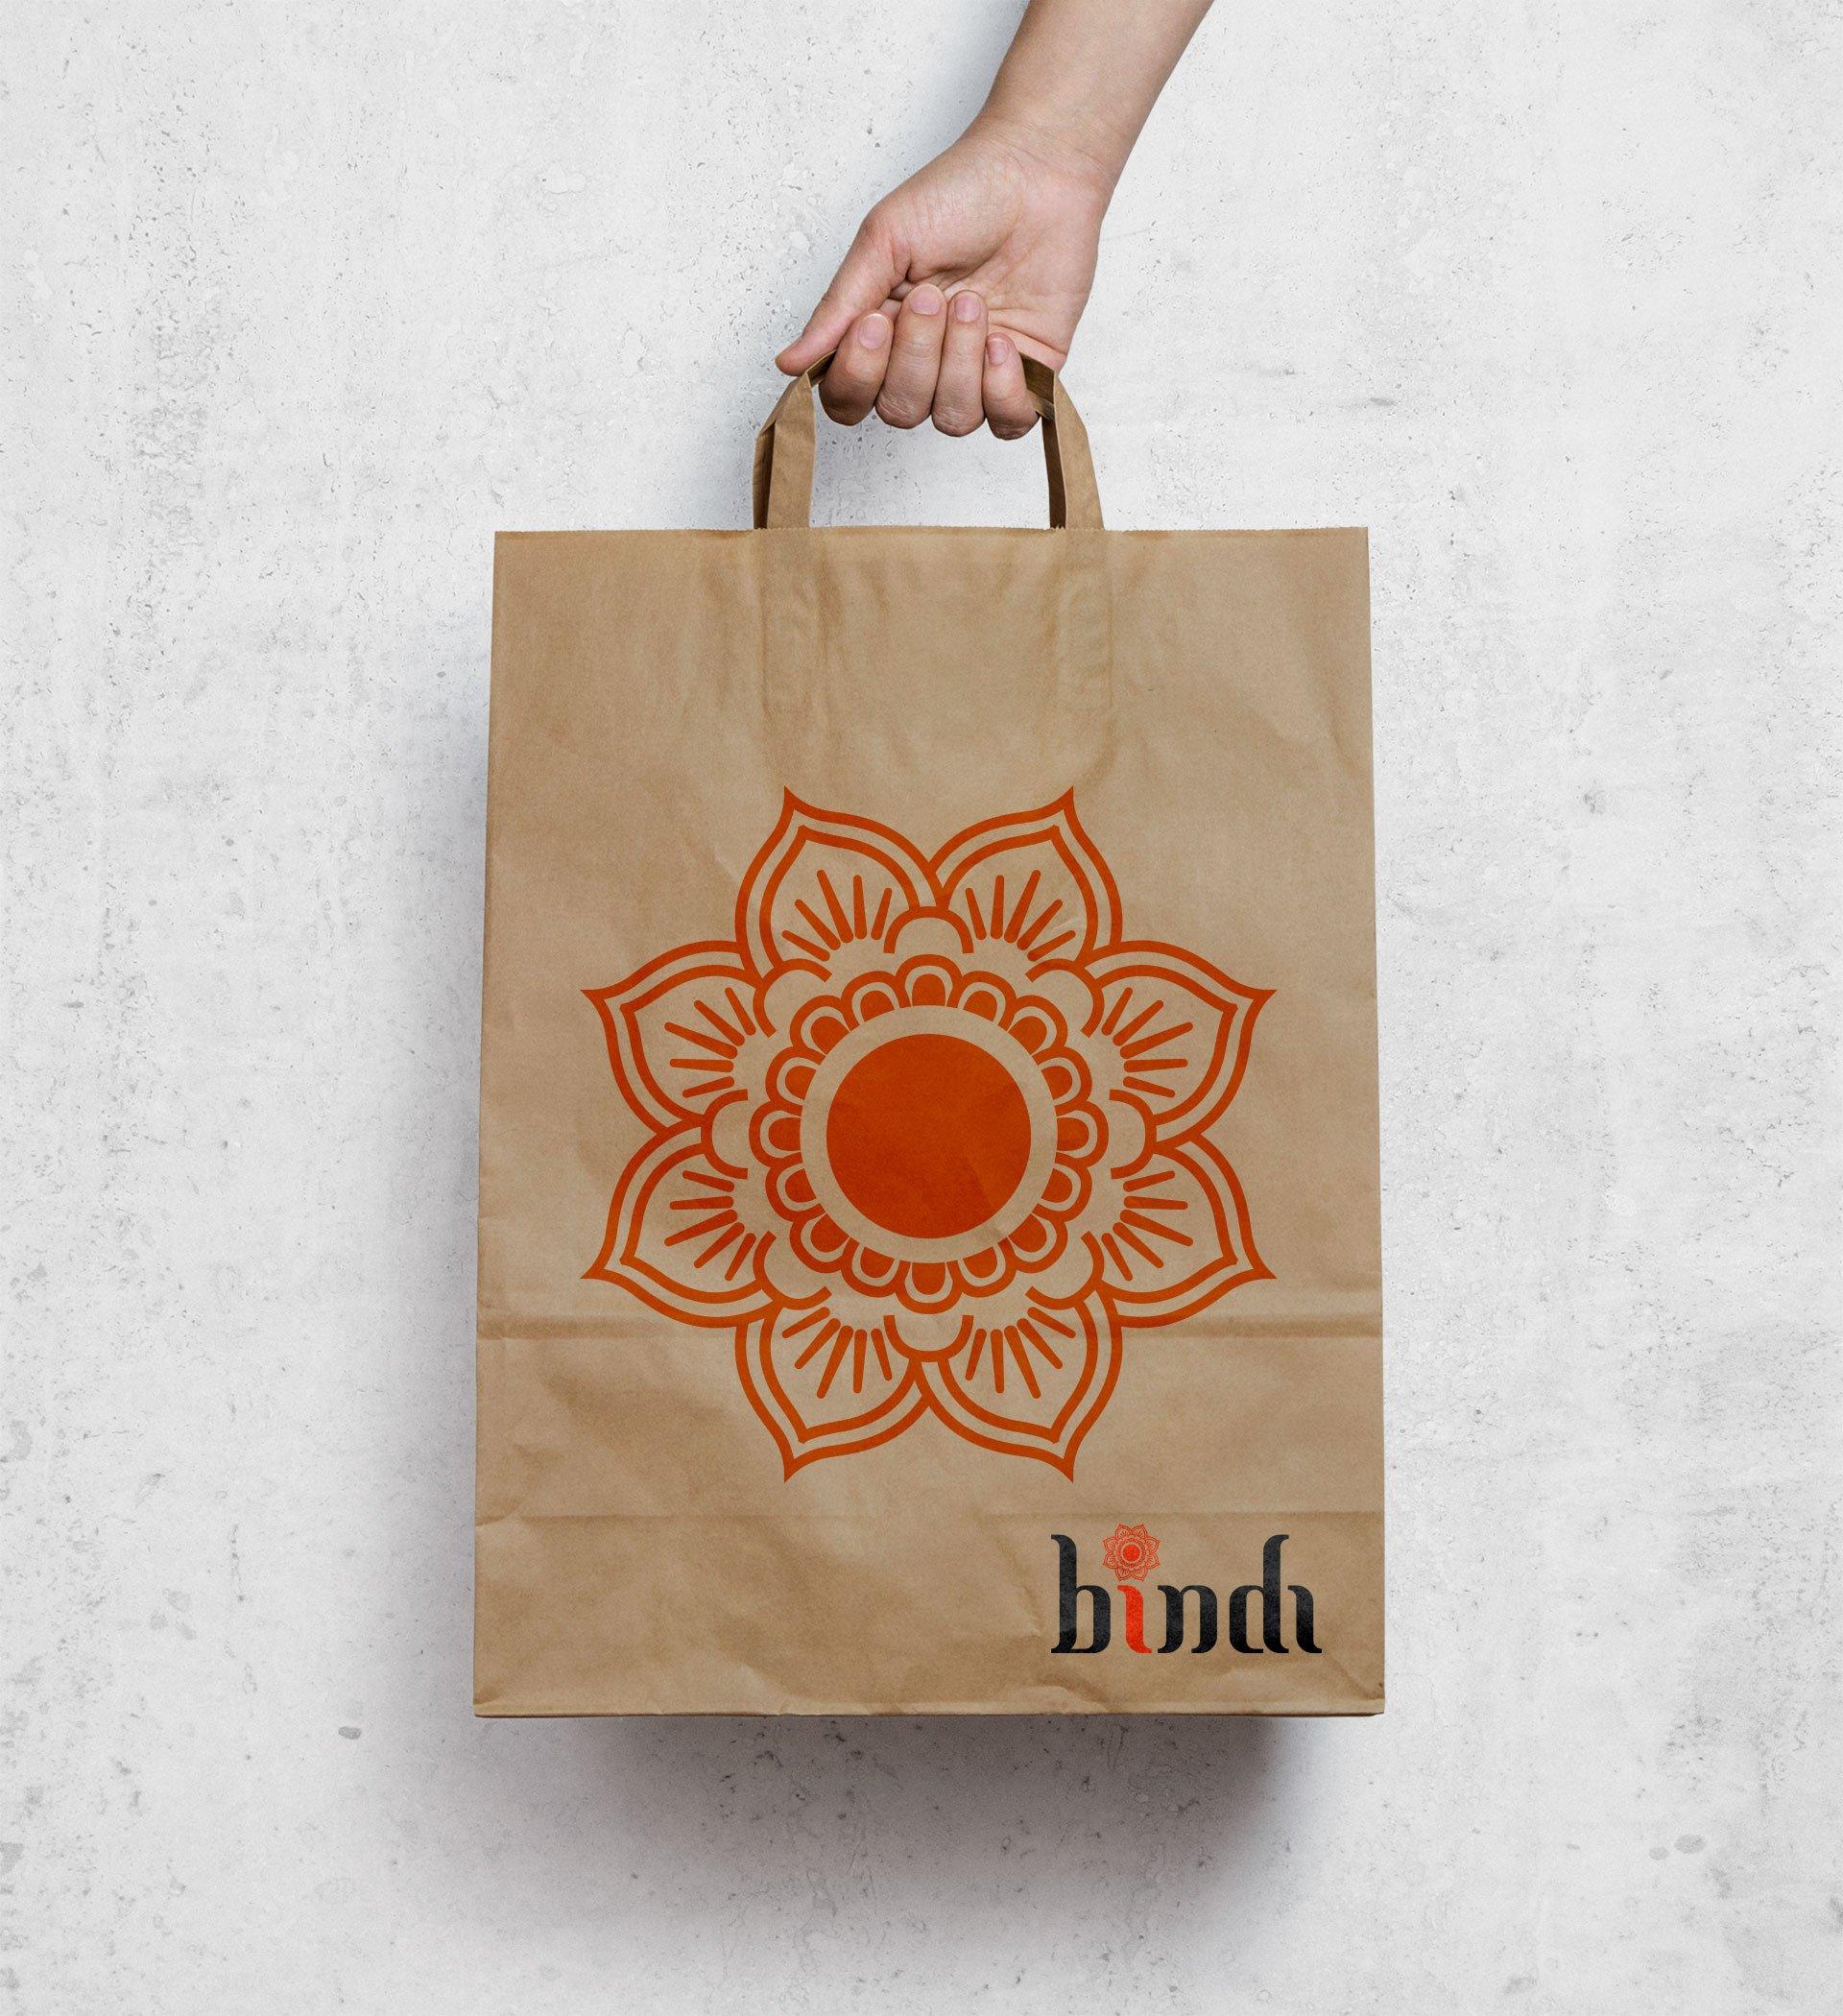 Bindi art on a paper bag